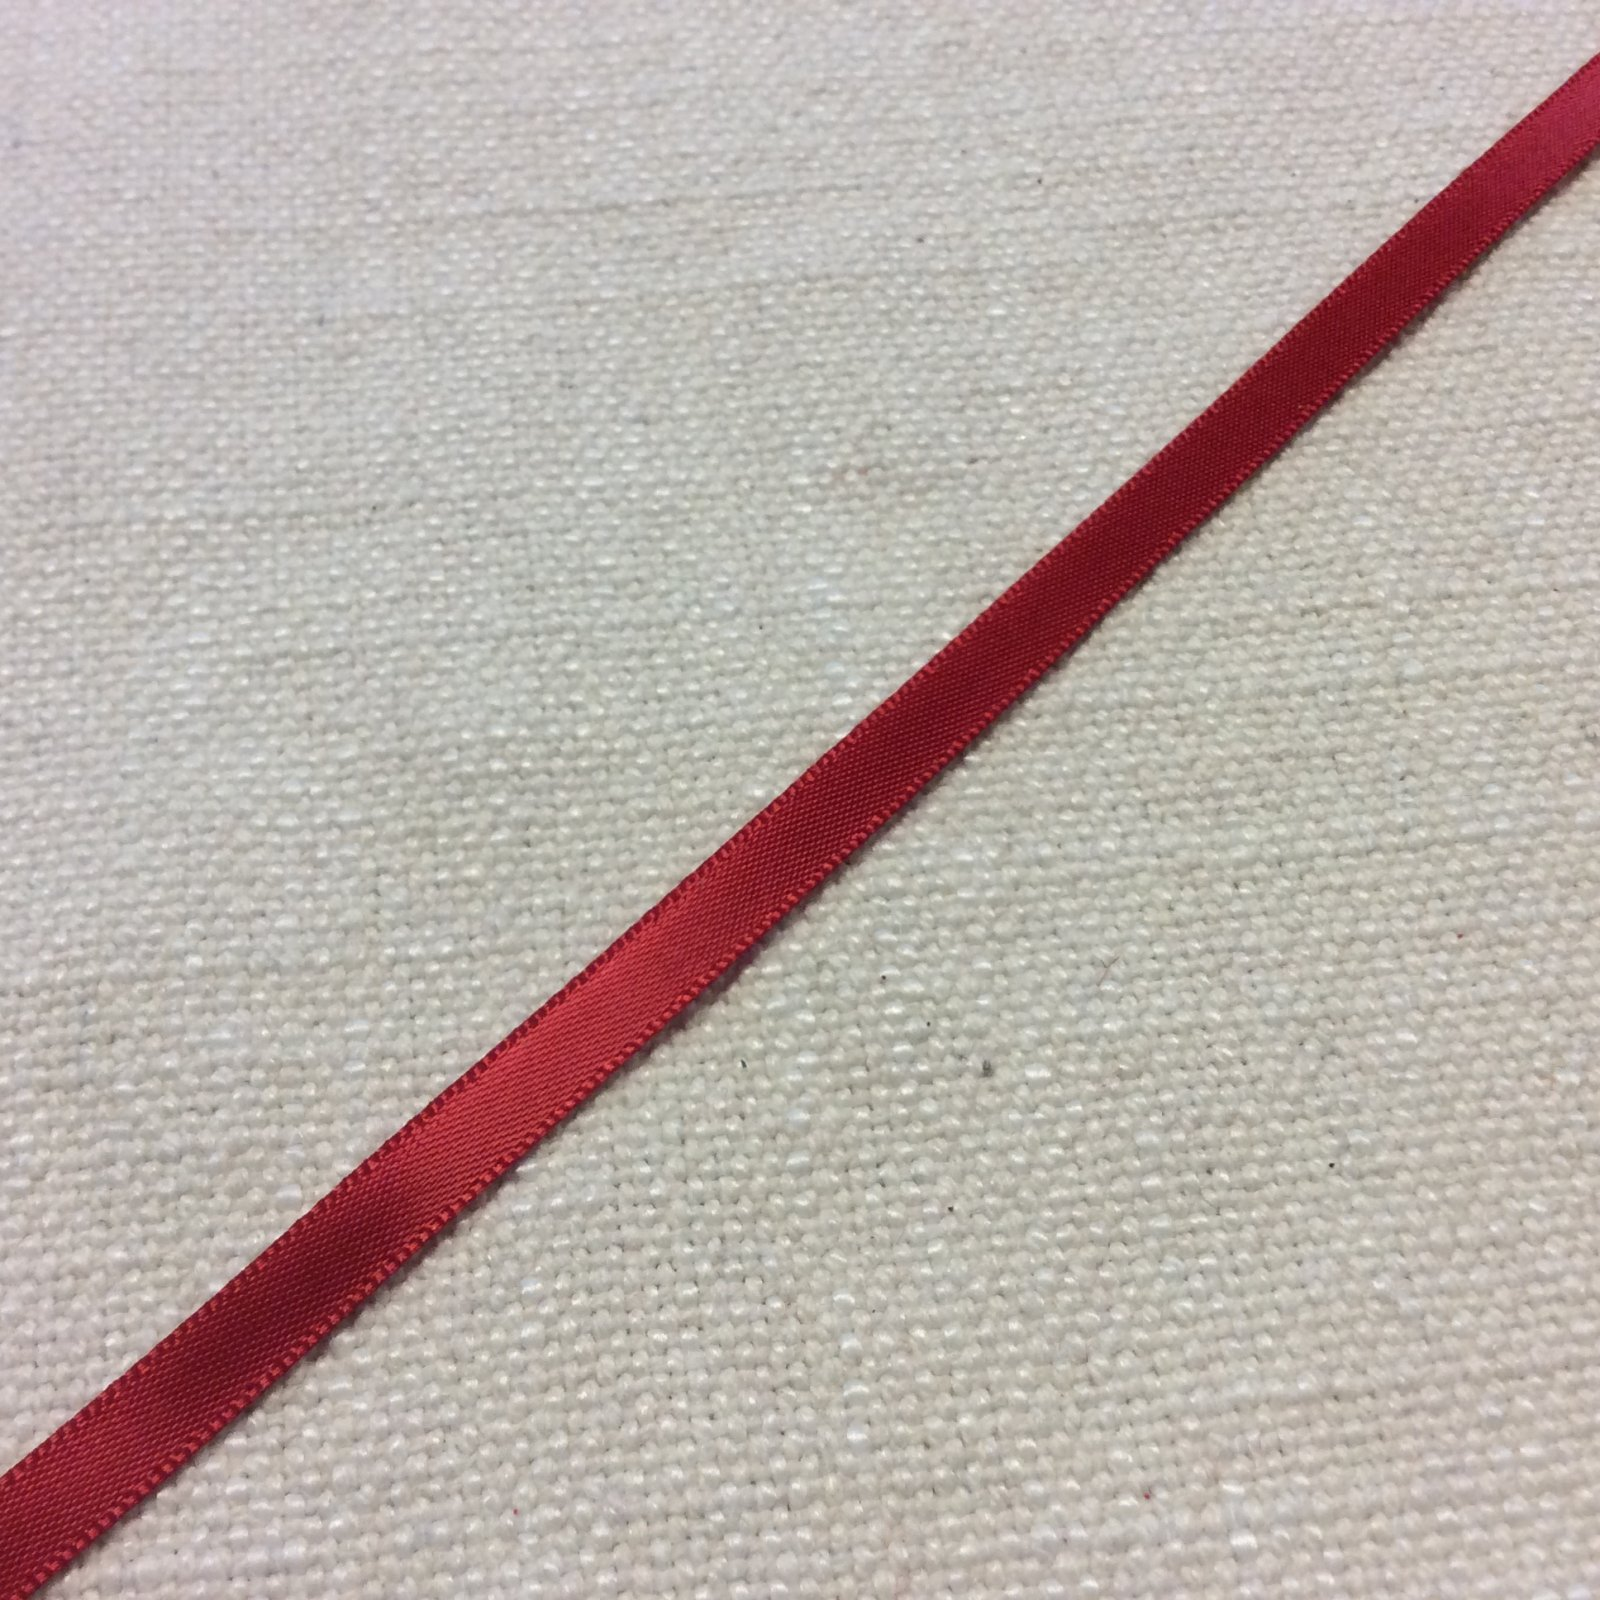 Satin Ribbon 1/4 Red Trim Ribbon RIB1264